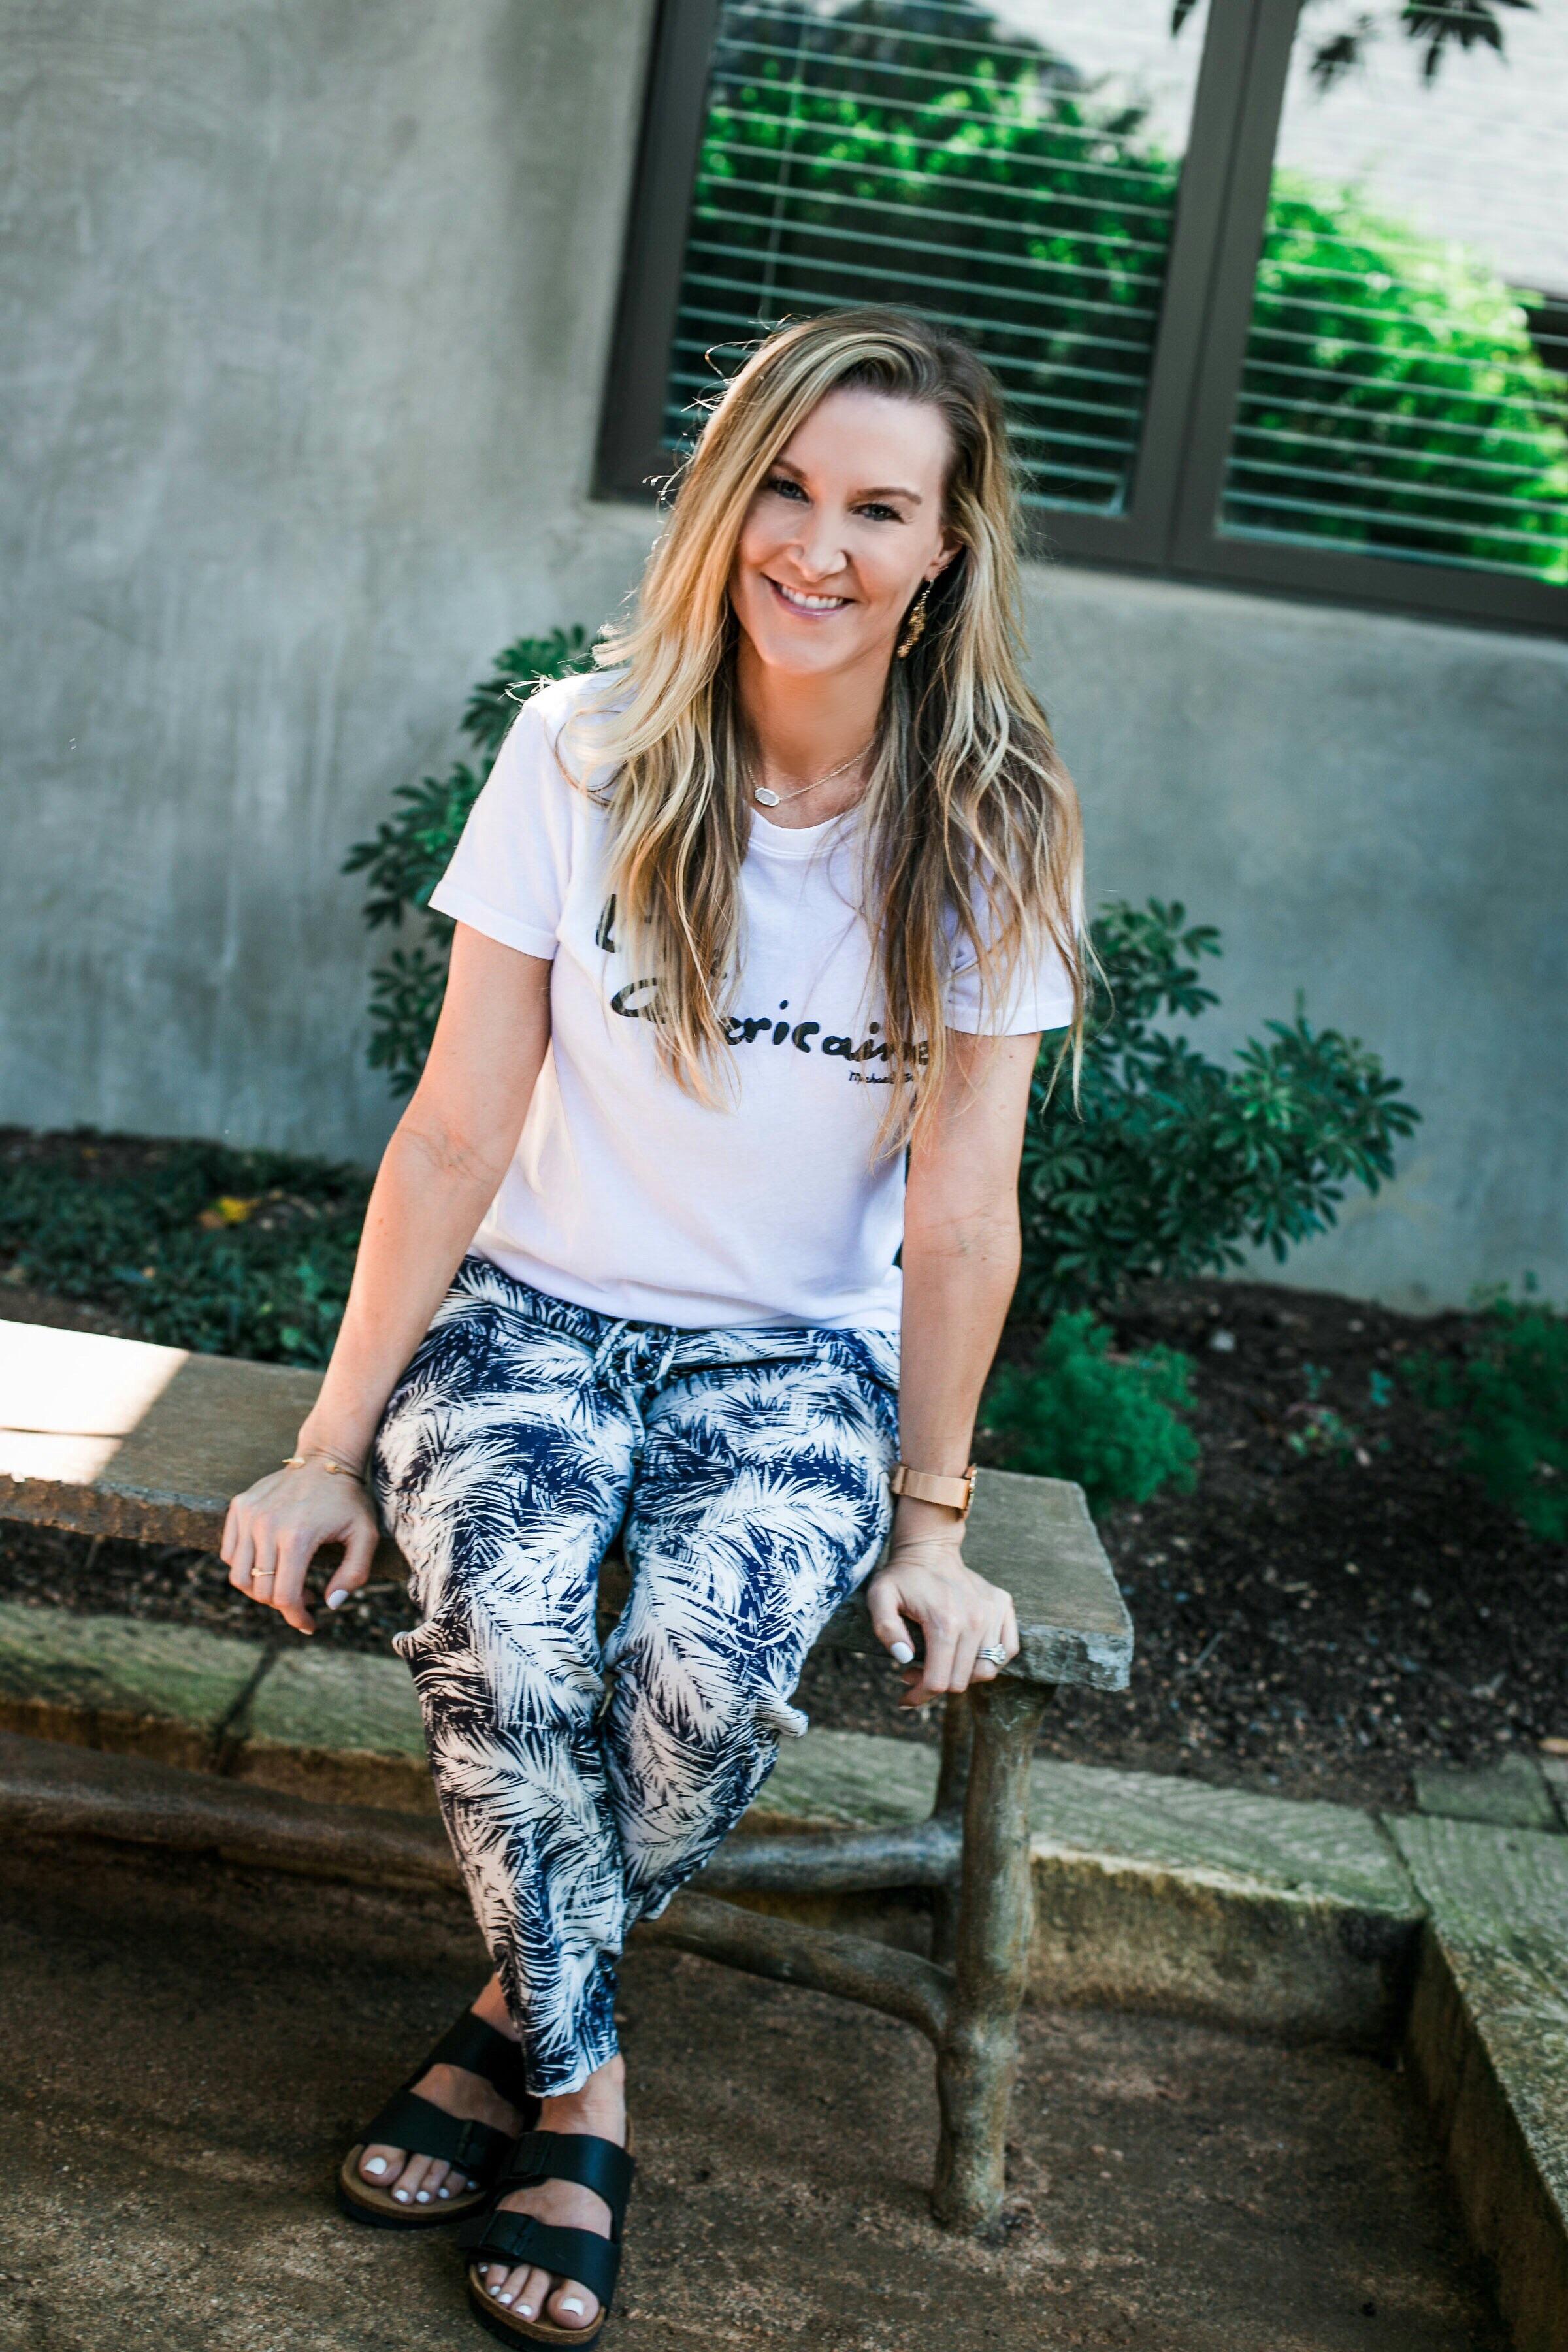 Heather-MS-tee-smile